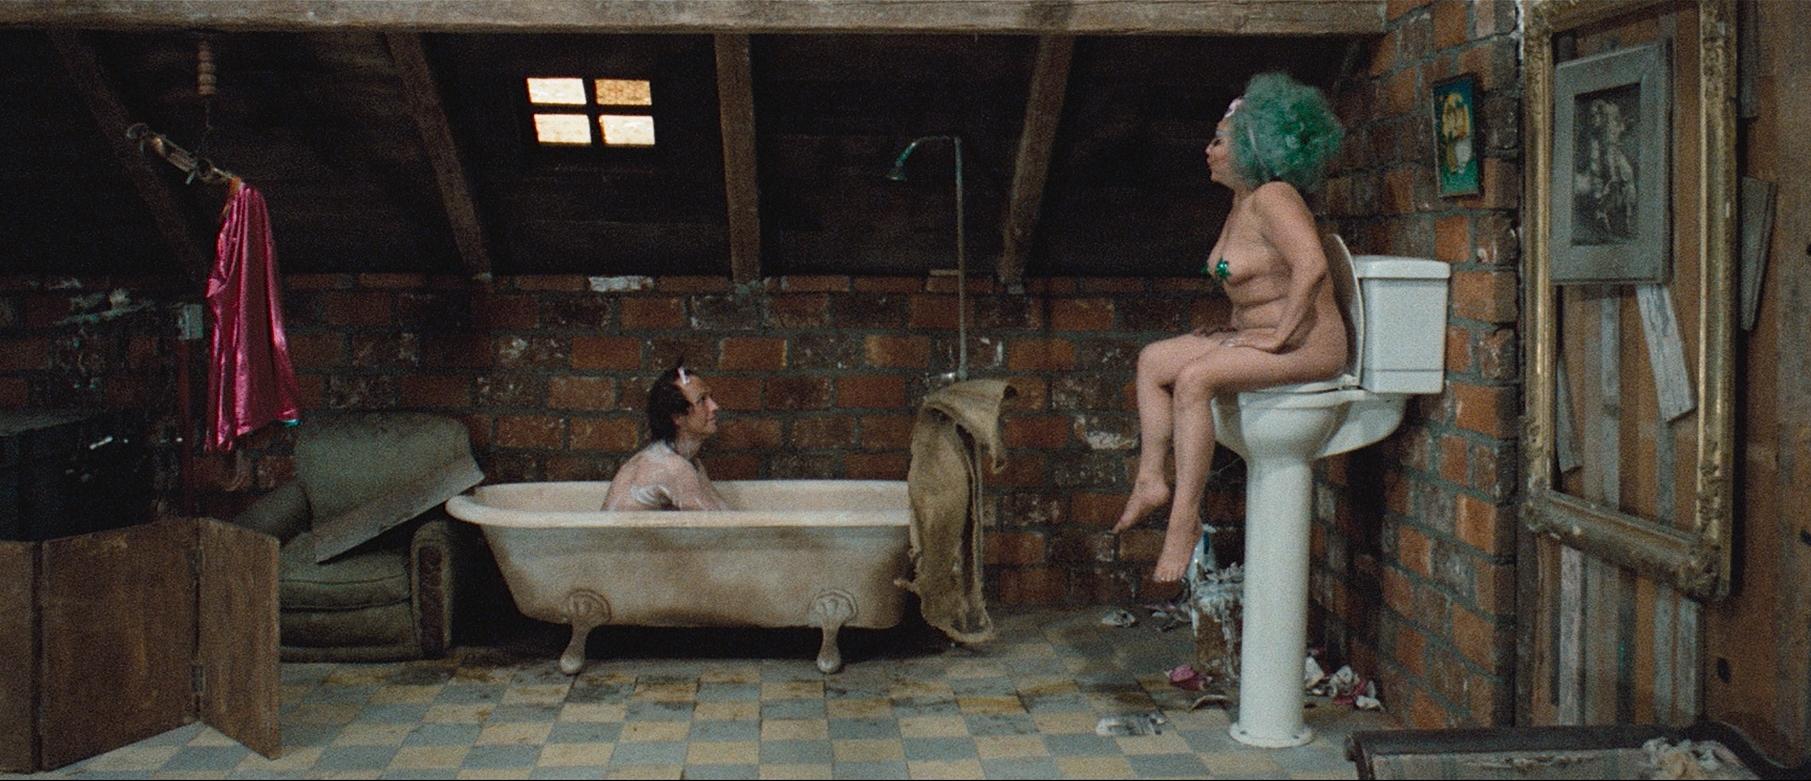 Nicky Nichols and Lupita Peruyero in La montaña sagrada (1973)